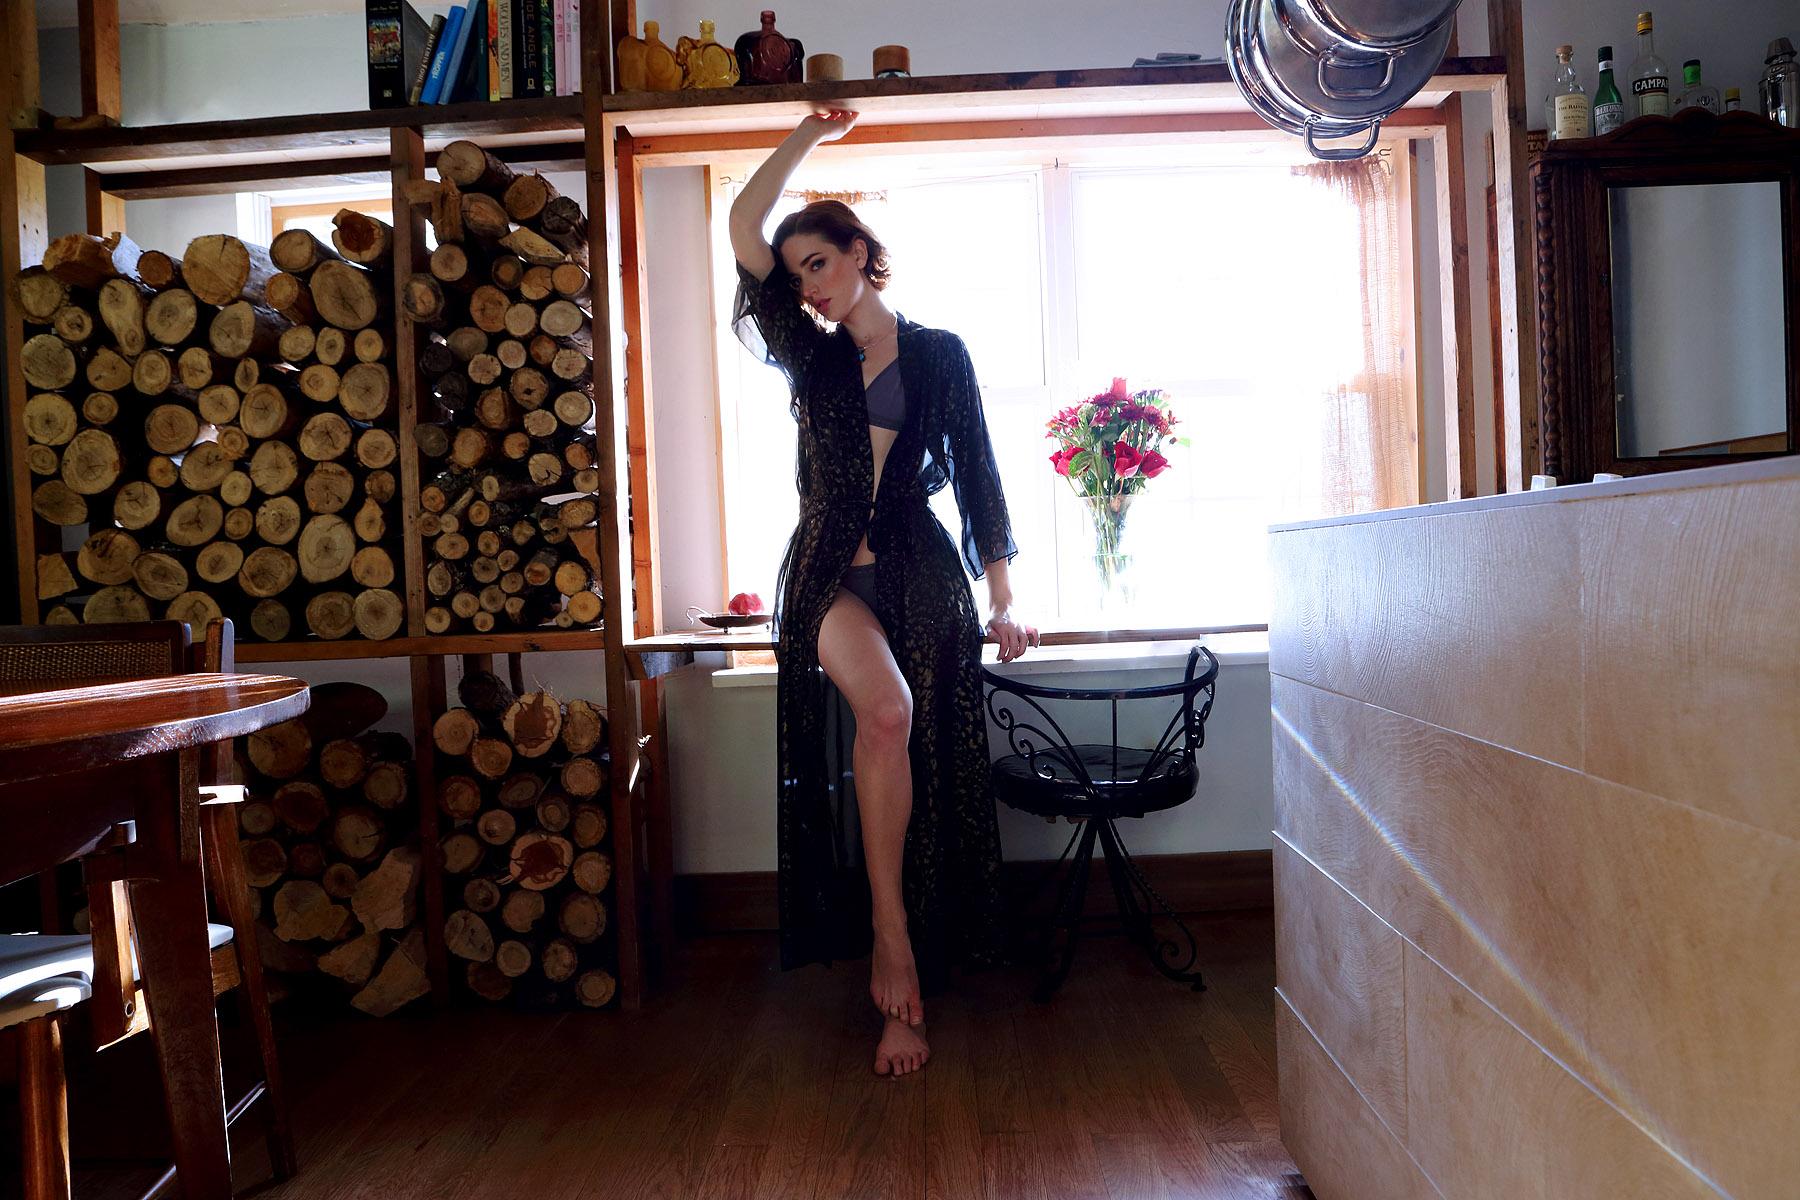 holiday-14-bts-lingerie-lookbook-black-leopard-play-robe-window-2.jpg